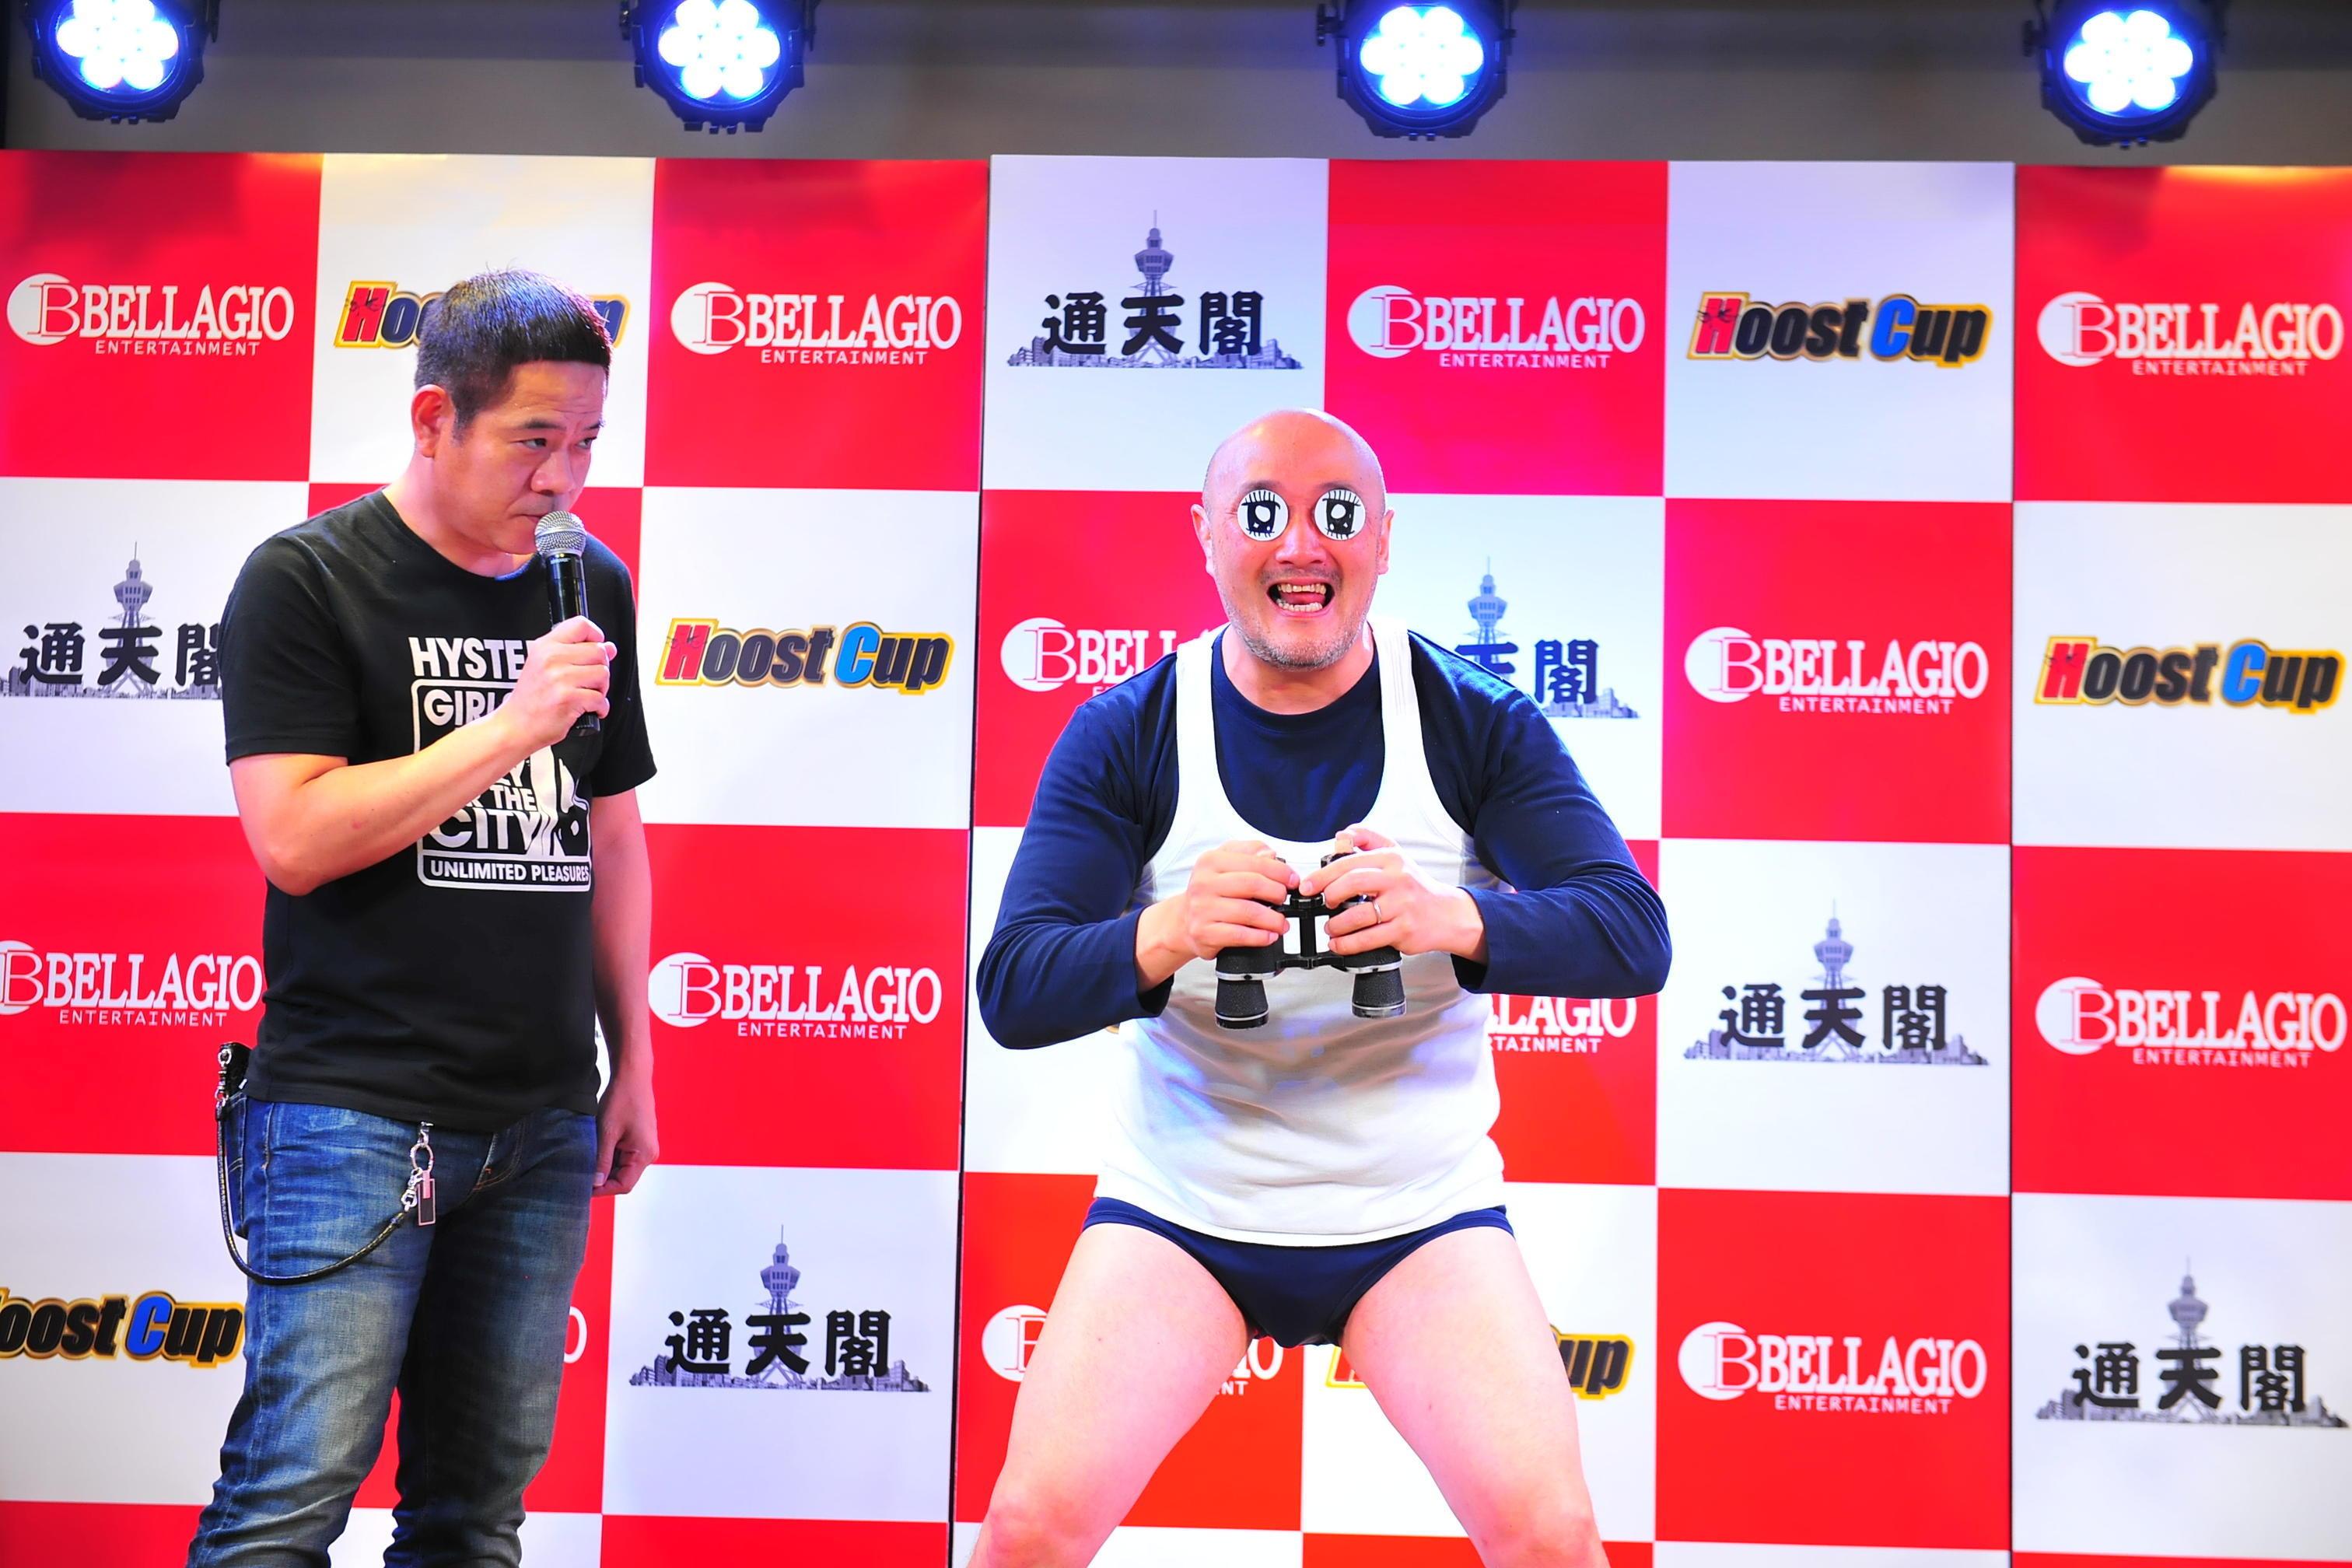 http://news.yoshimoto.co.jp/20160830234628-4e591973cfedbeaed97ee2c511fd7eab07f42434.jpg